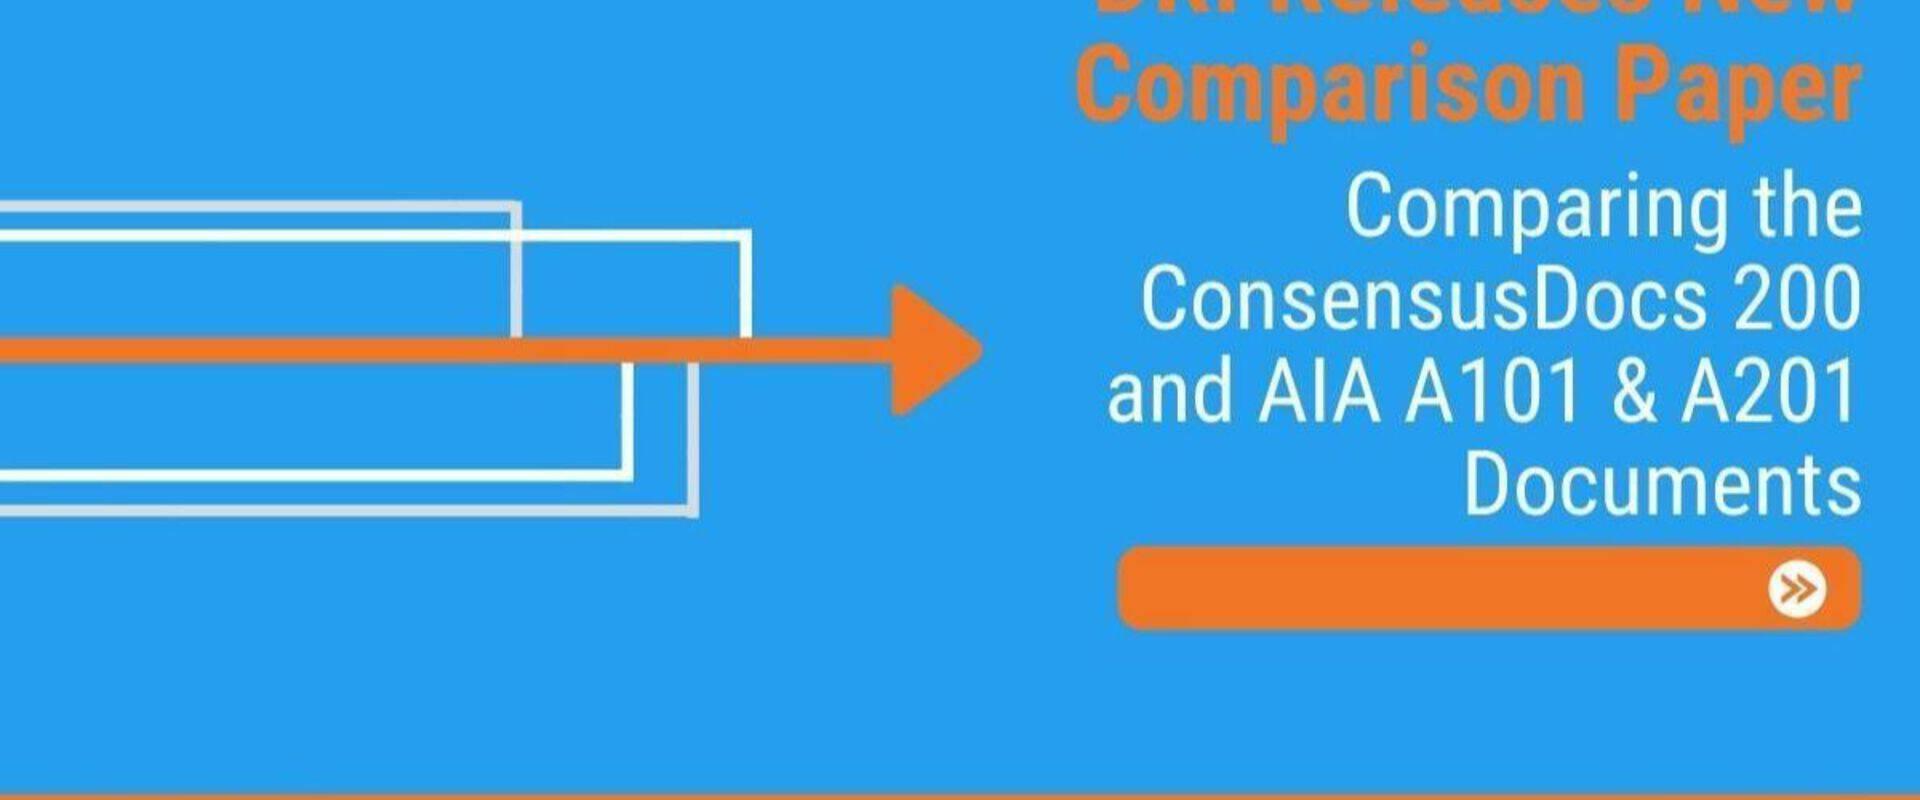 Michael Catania Co-Authors DRI Construction Law Paper